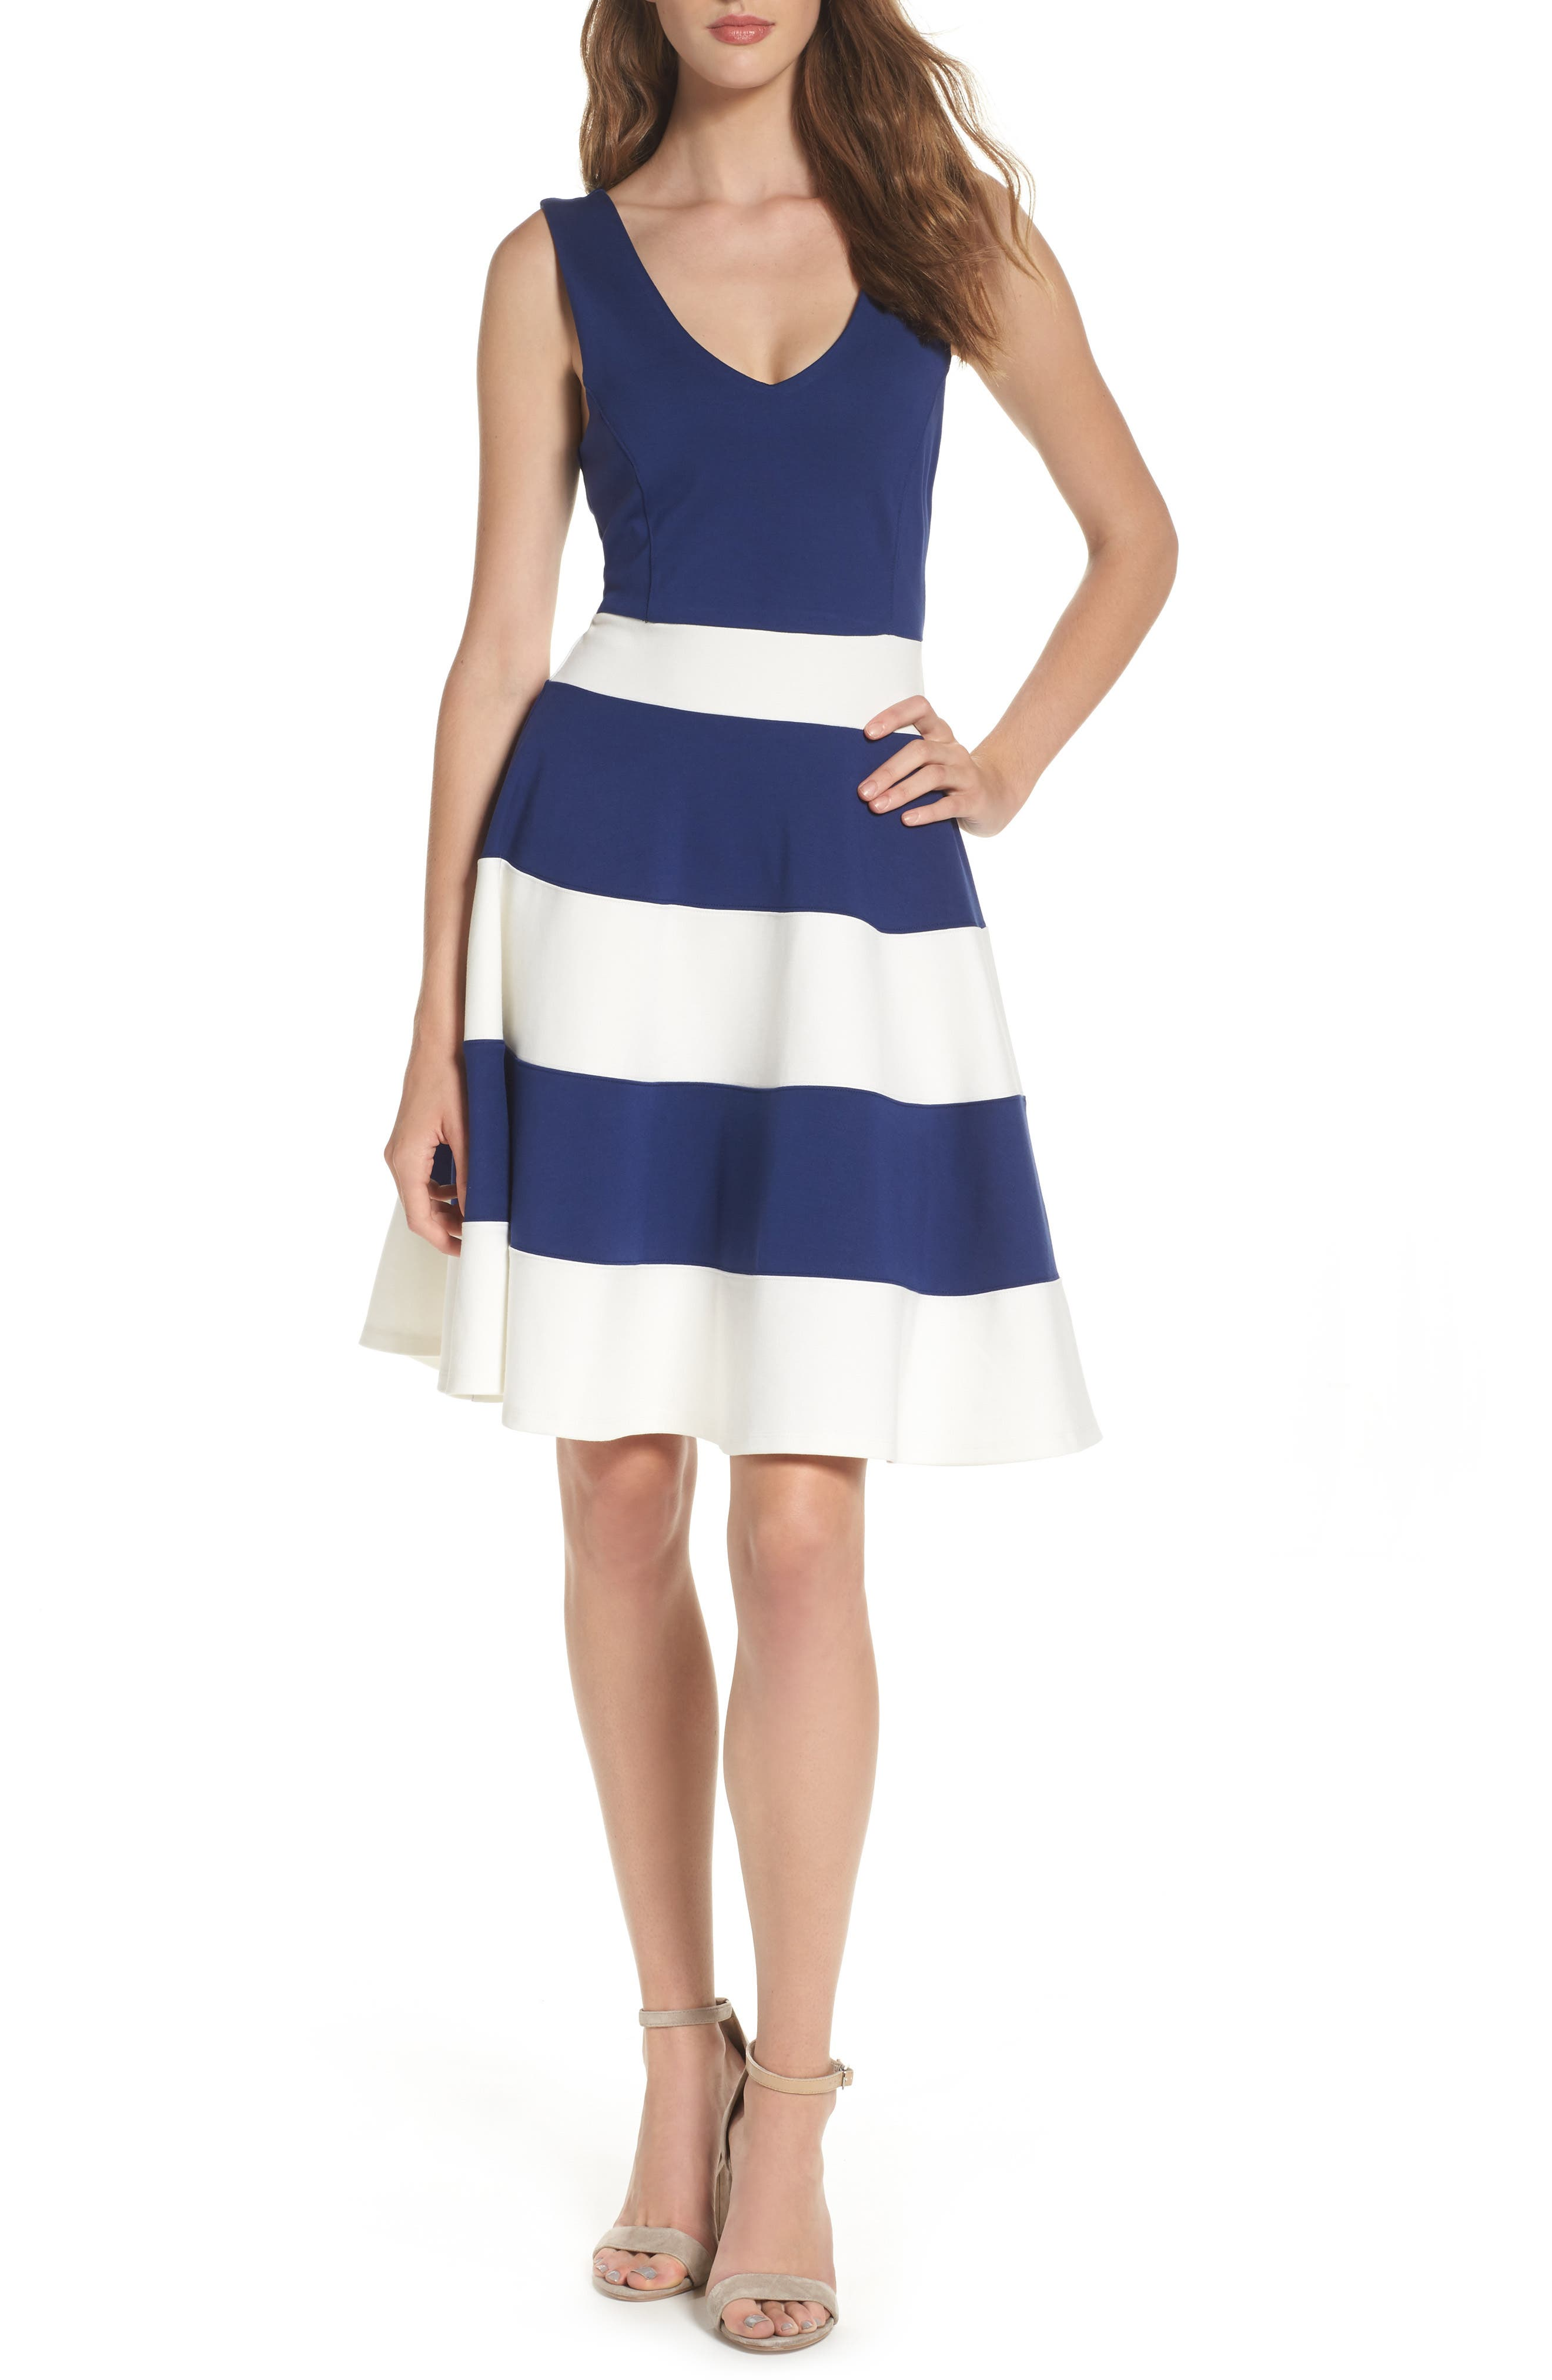 Joice Sleeveless Fit & Flare Dress,                             Main thumbnail 1, color,                             409